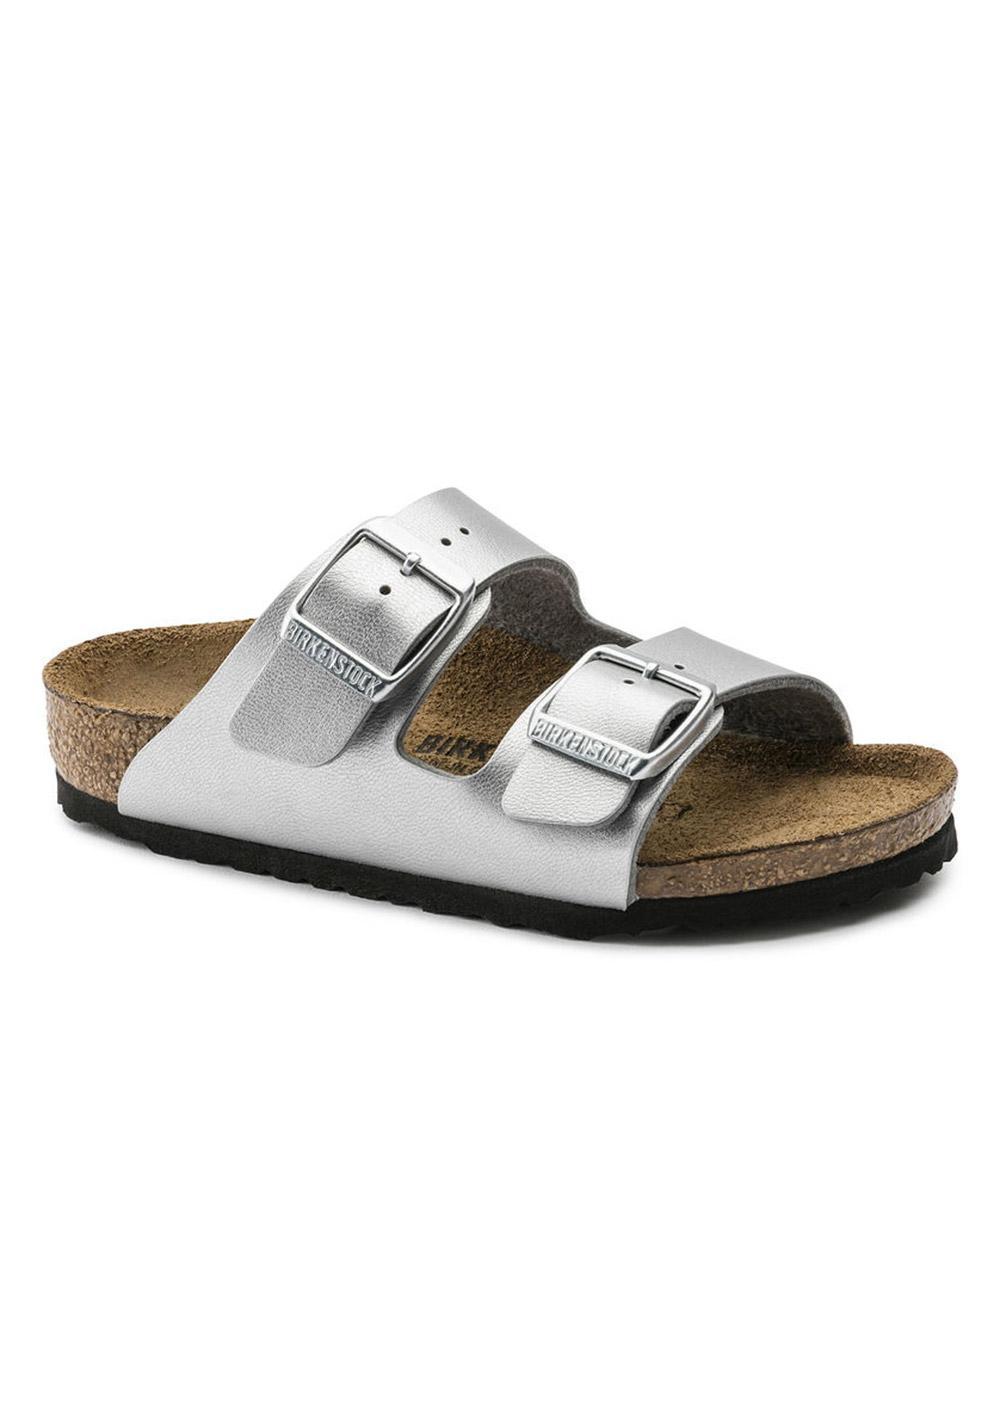 y) Sandale Birkenstock Arizona BF Größe: 31 Farbe: Silber